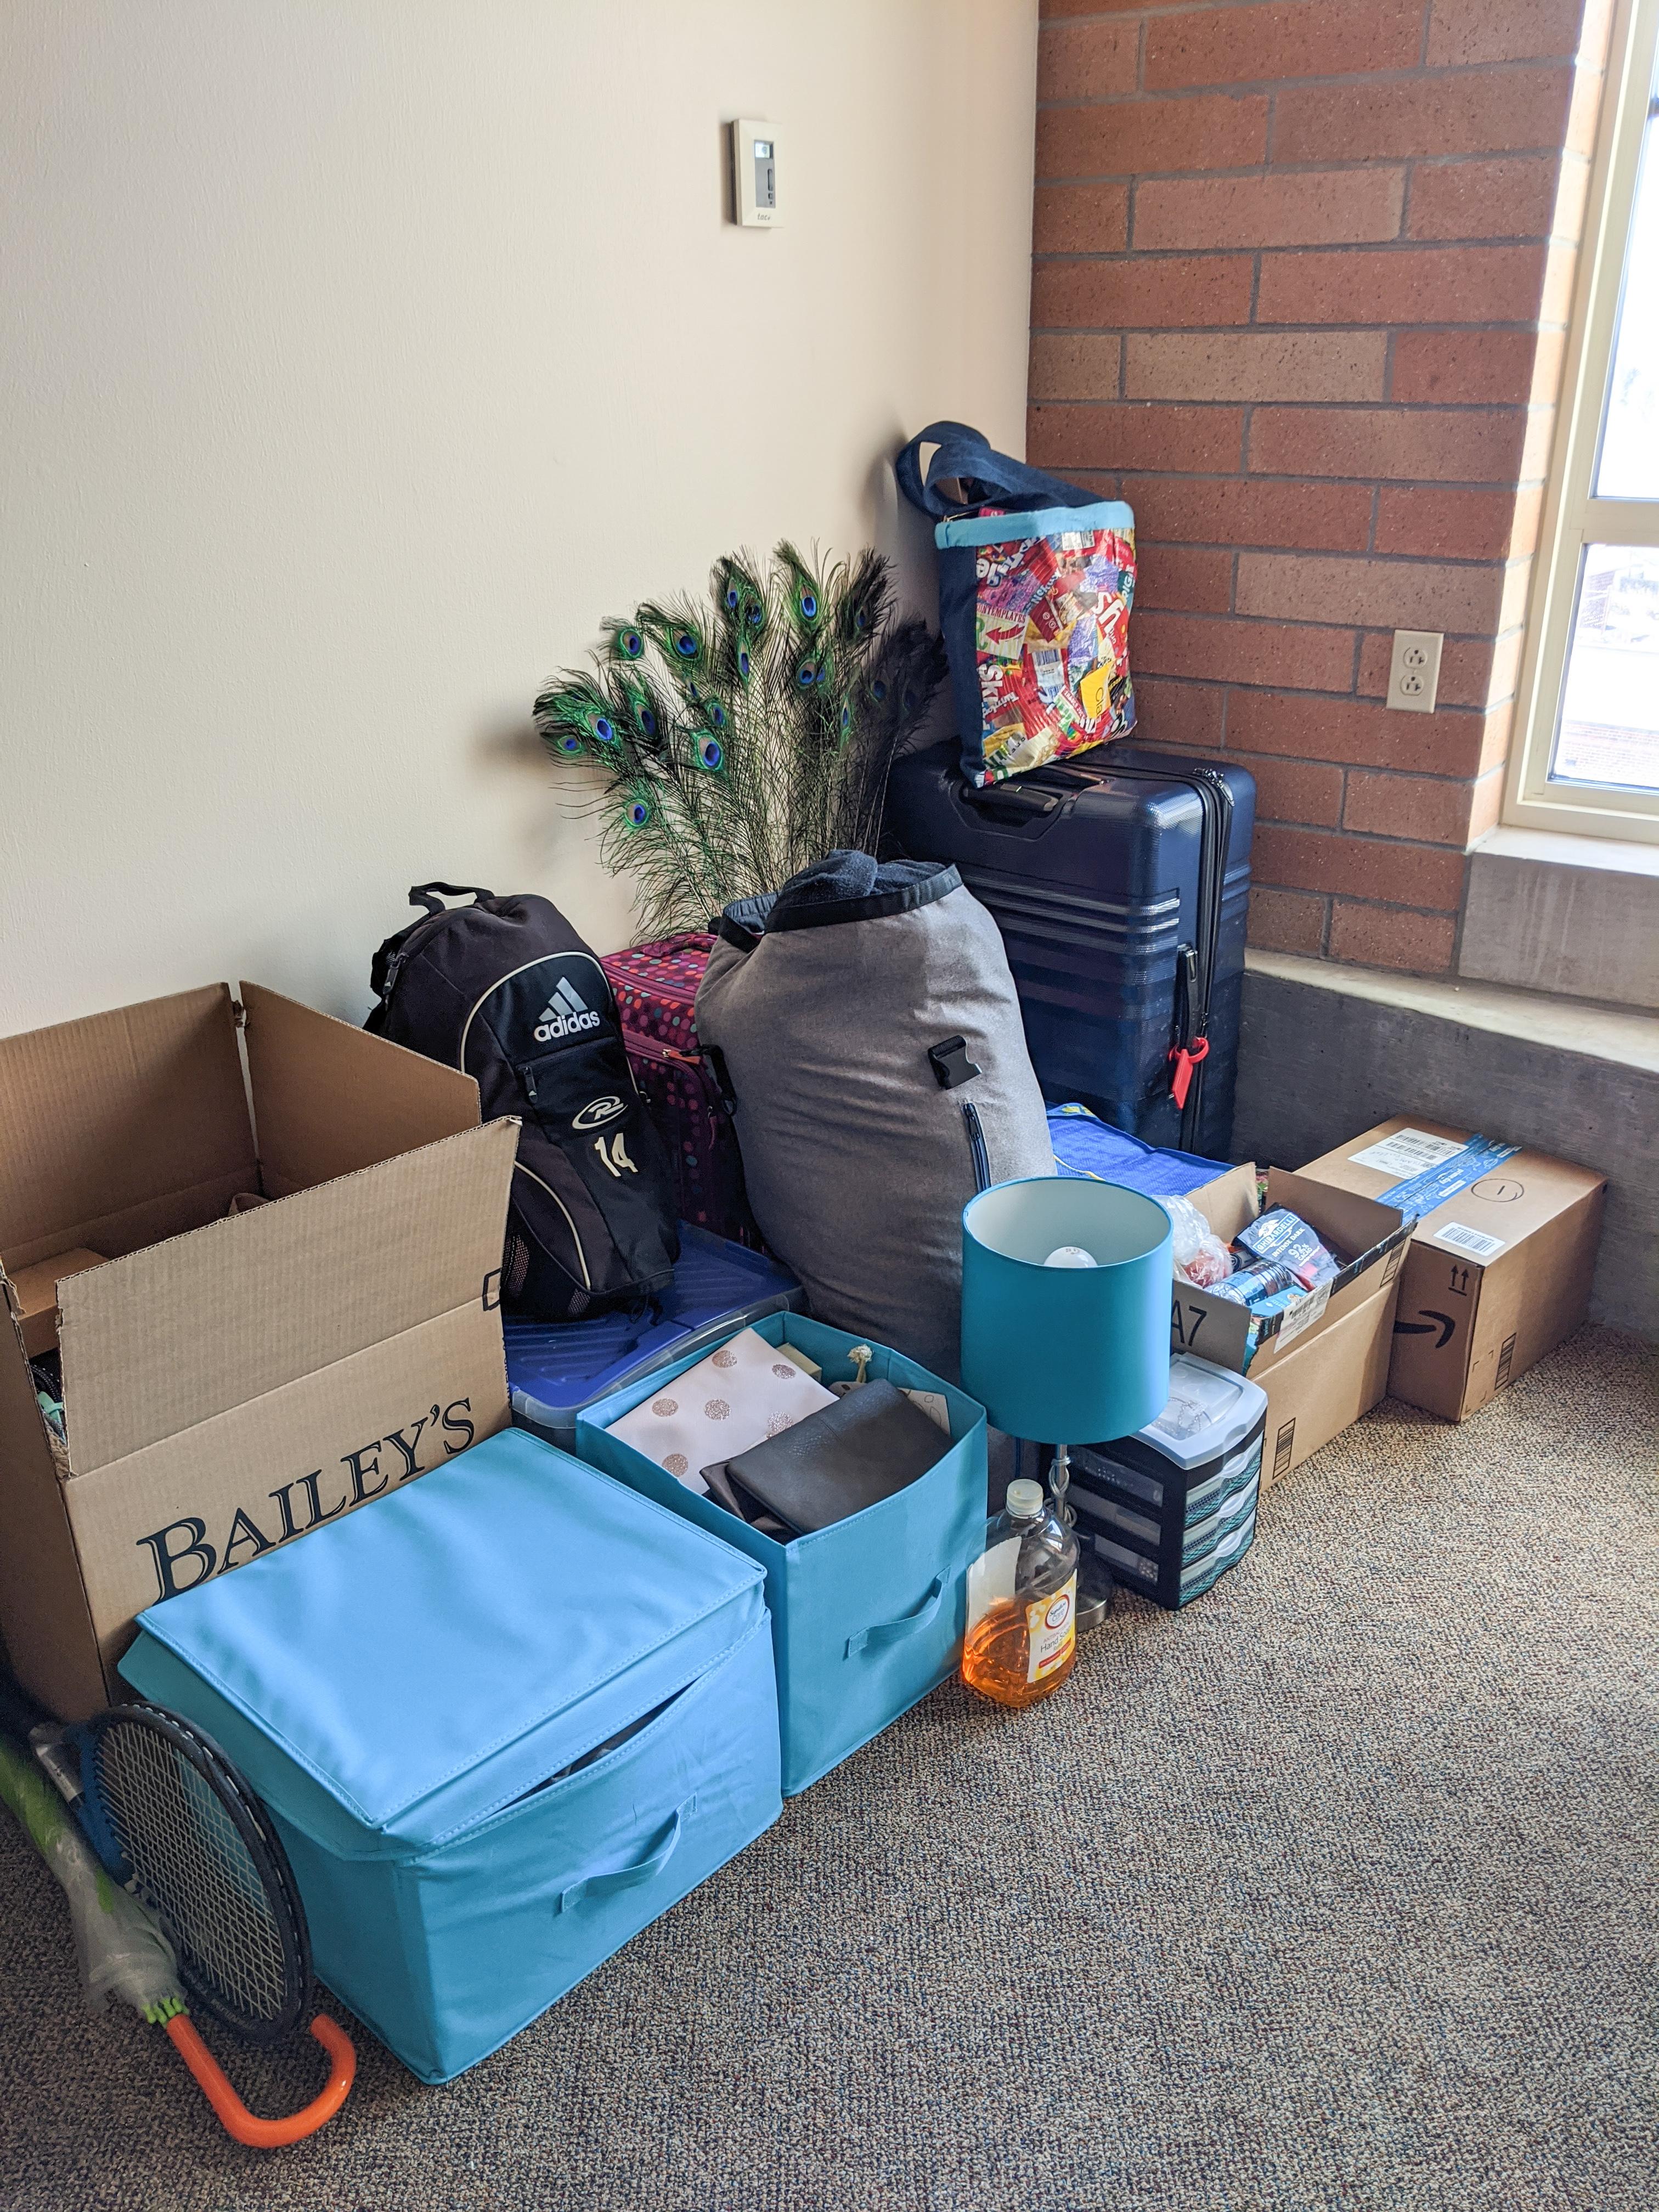 packing up, moving, college dorm room, dorm living